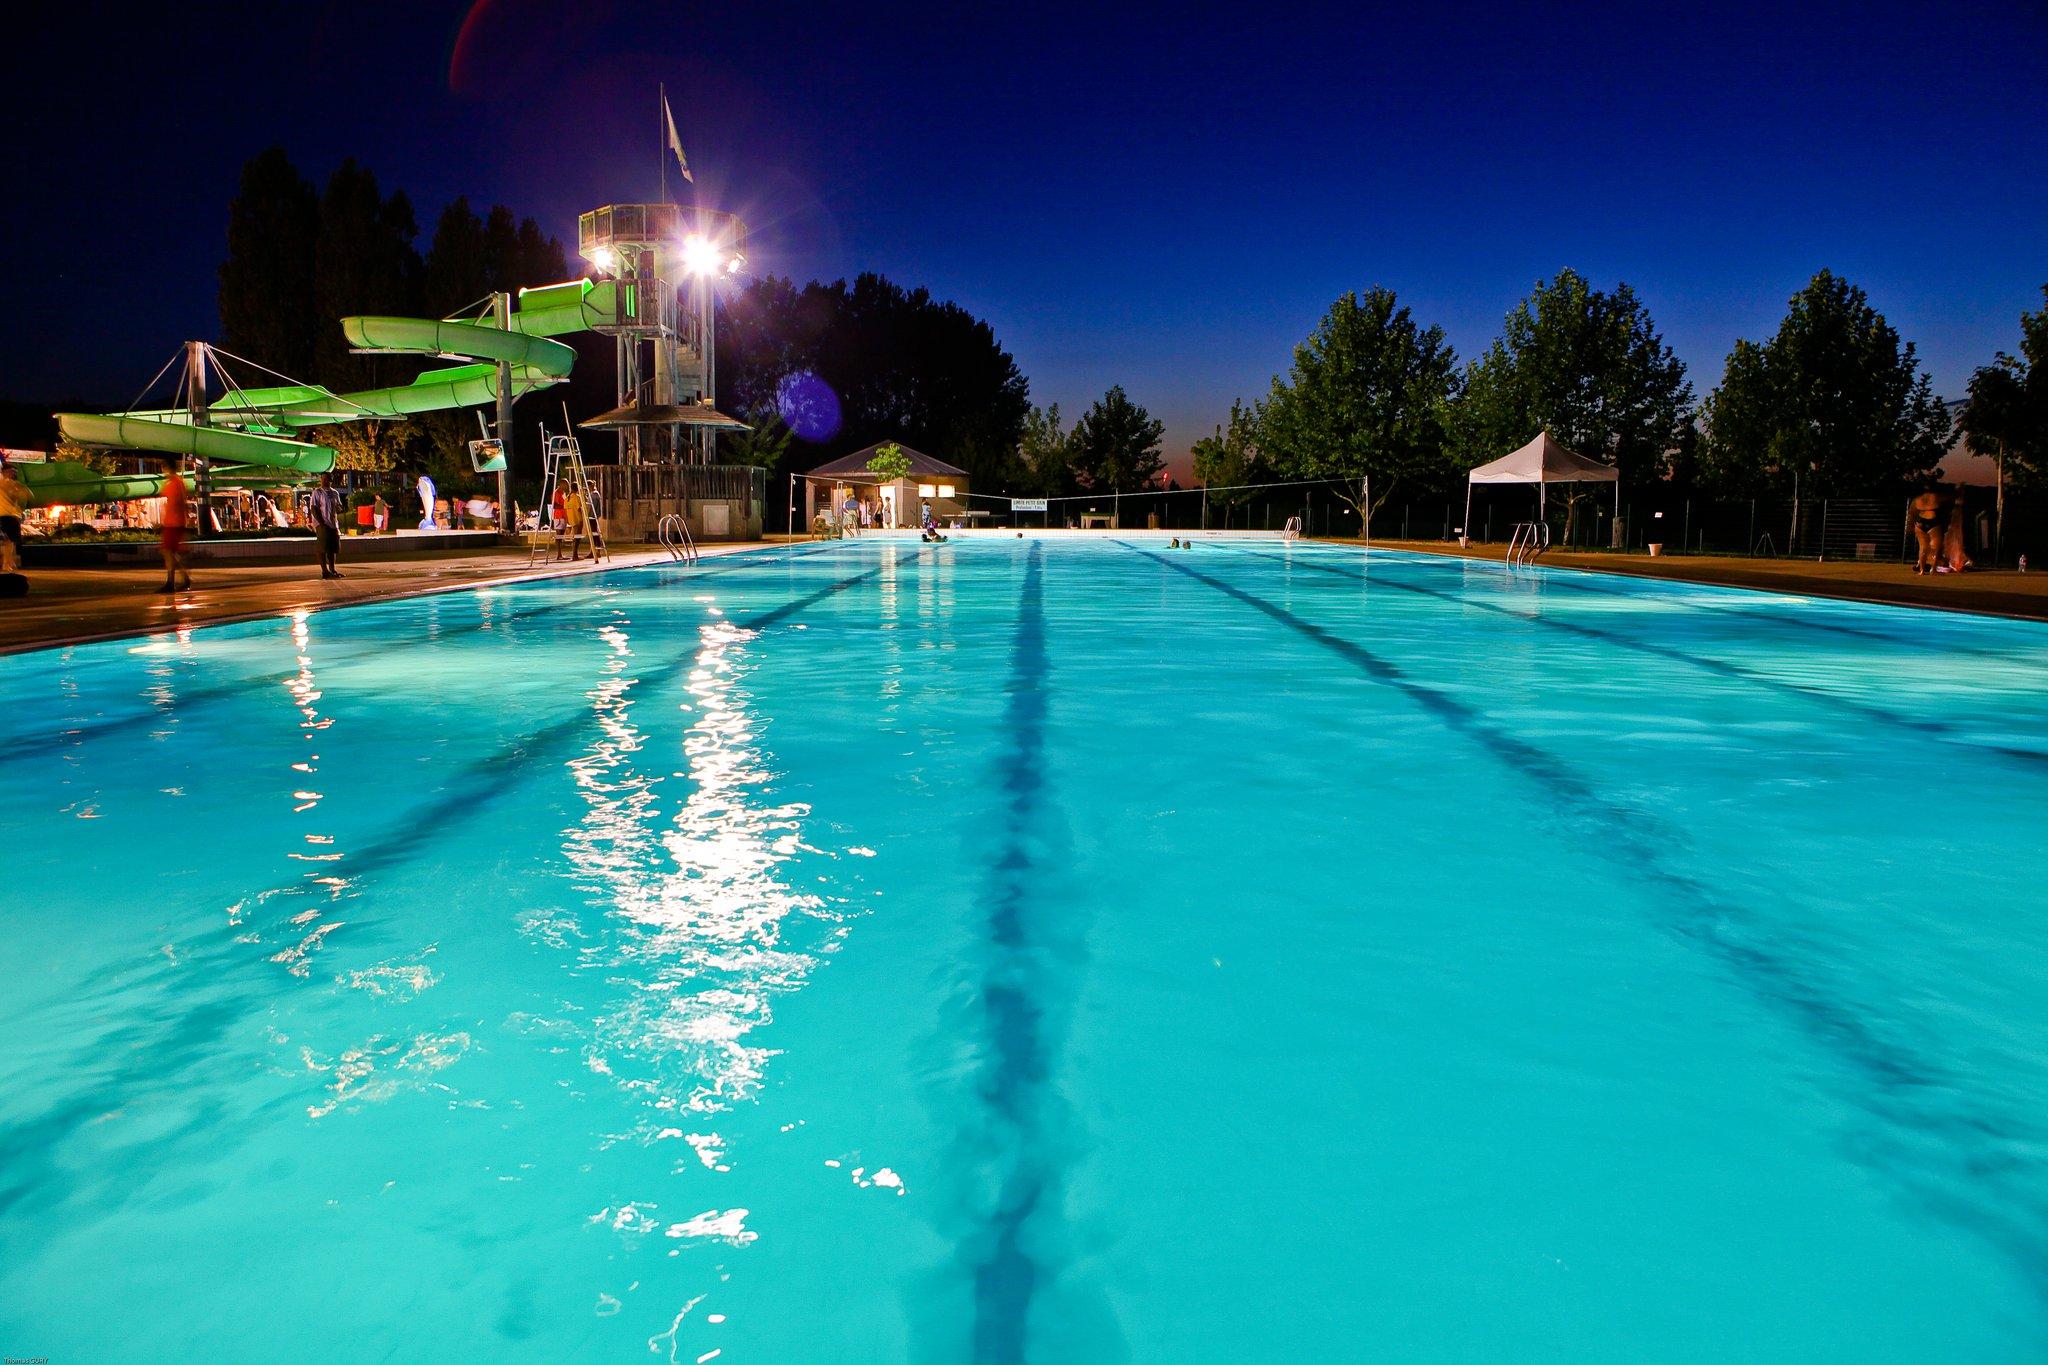 Piscine En Bois Petite Taille piscine — wikipédia